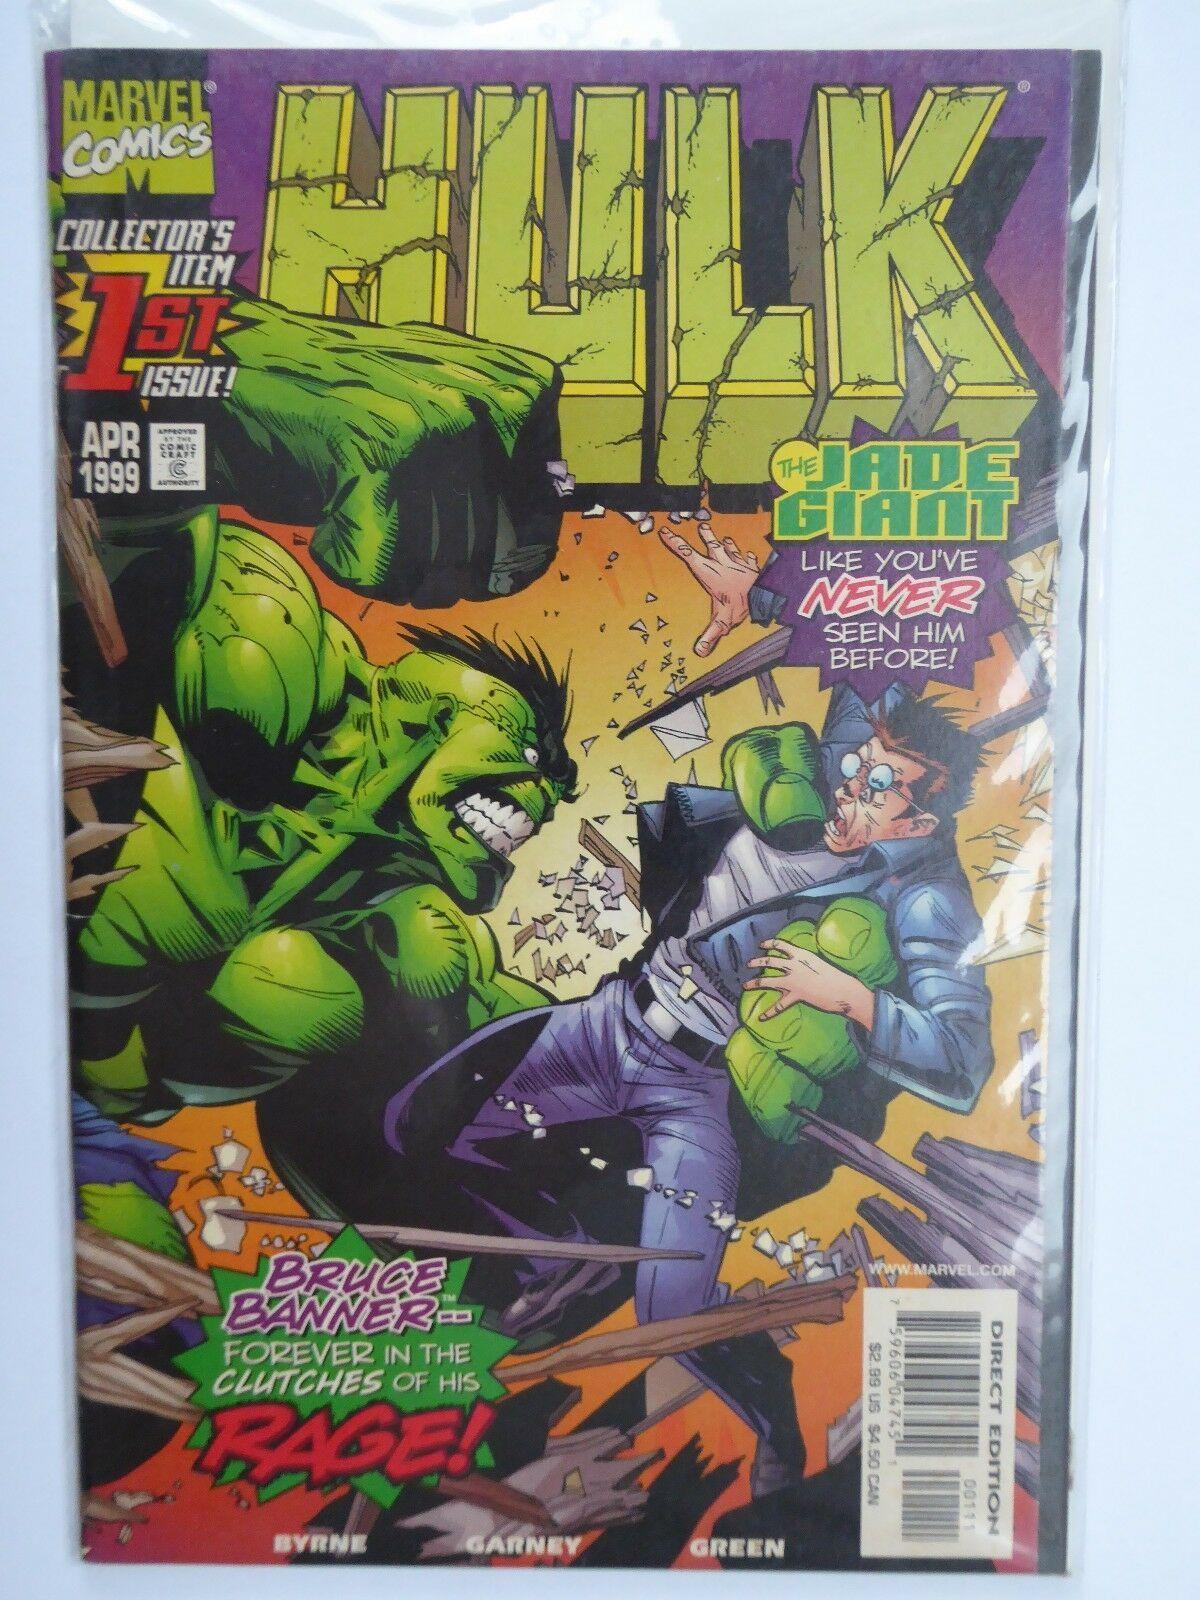 Hulk Collector's Item #1 The Jade Giant (Apr 1999, Marvel Comics) Vintage